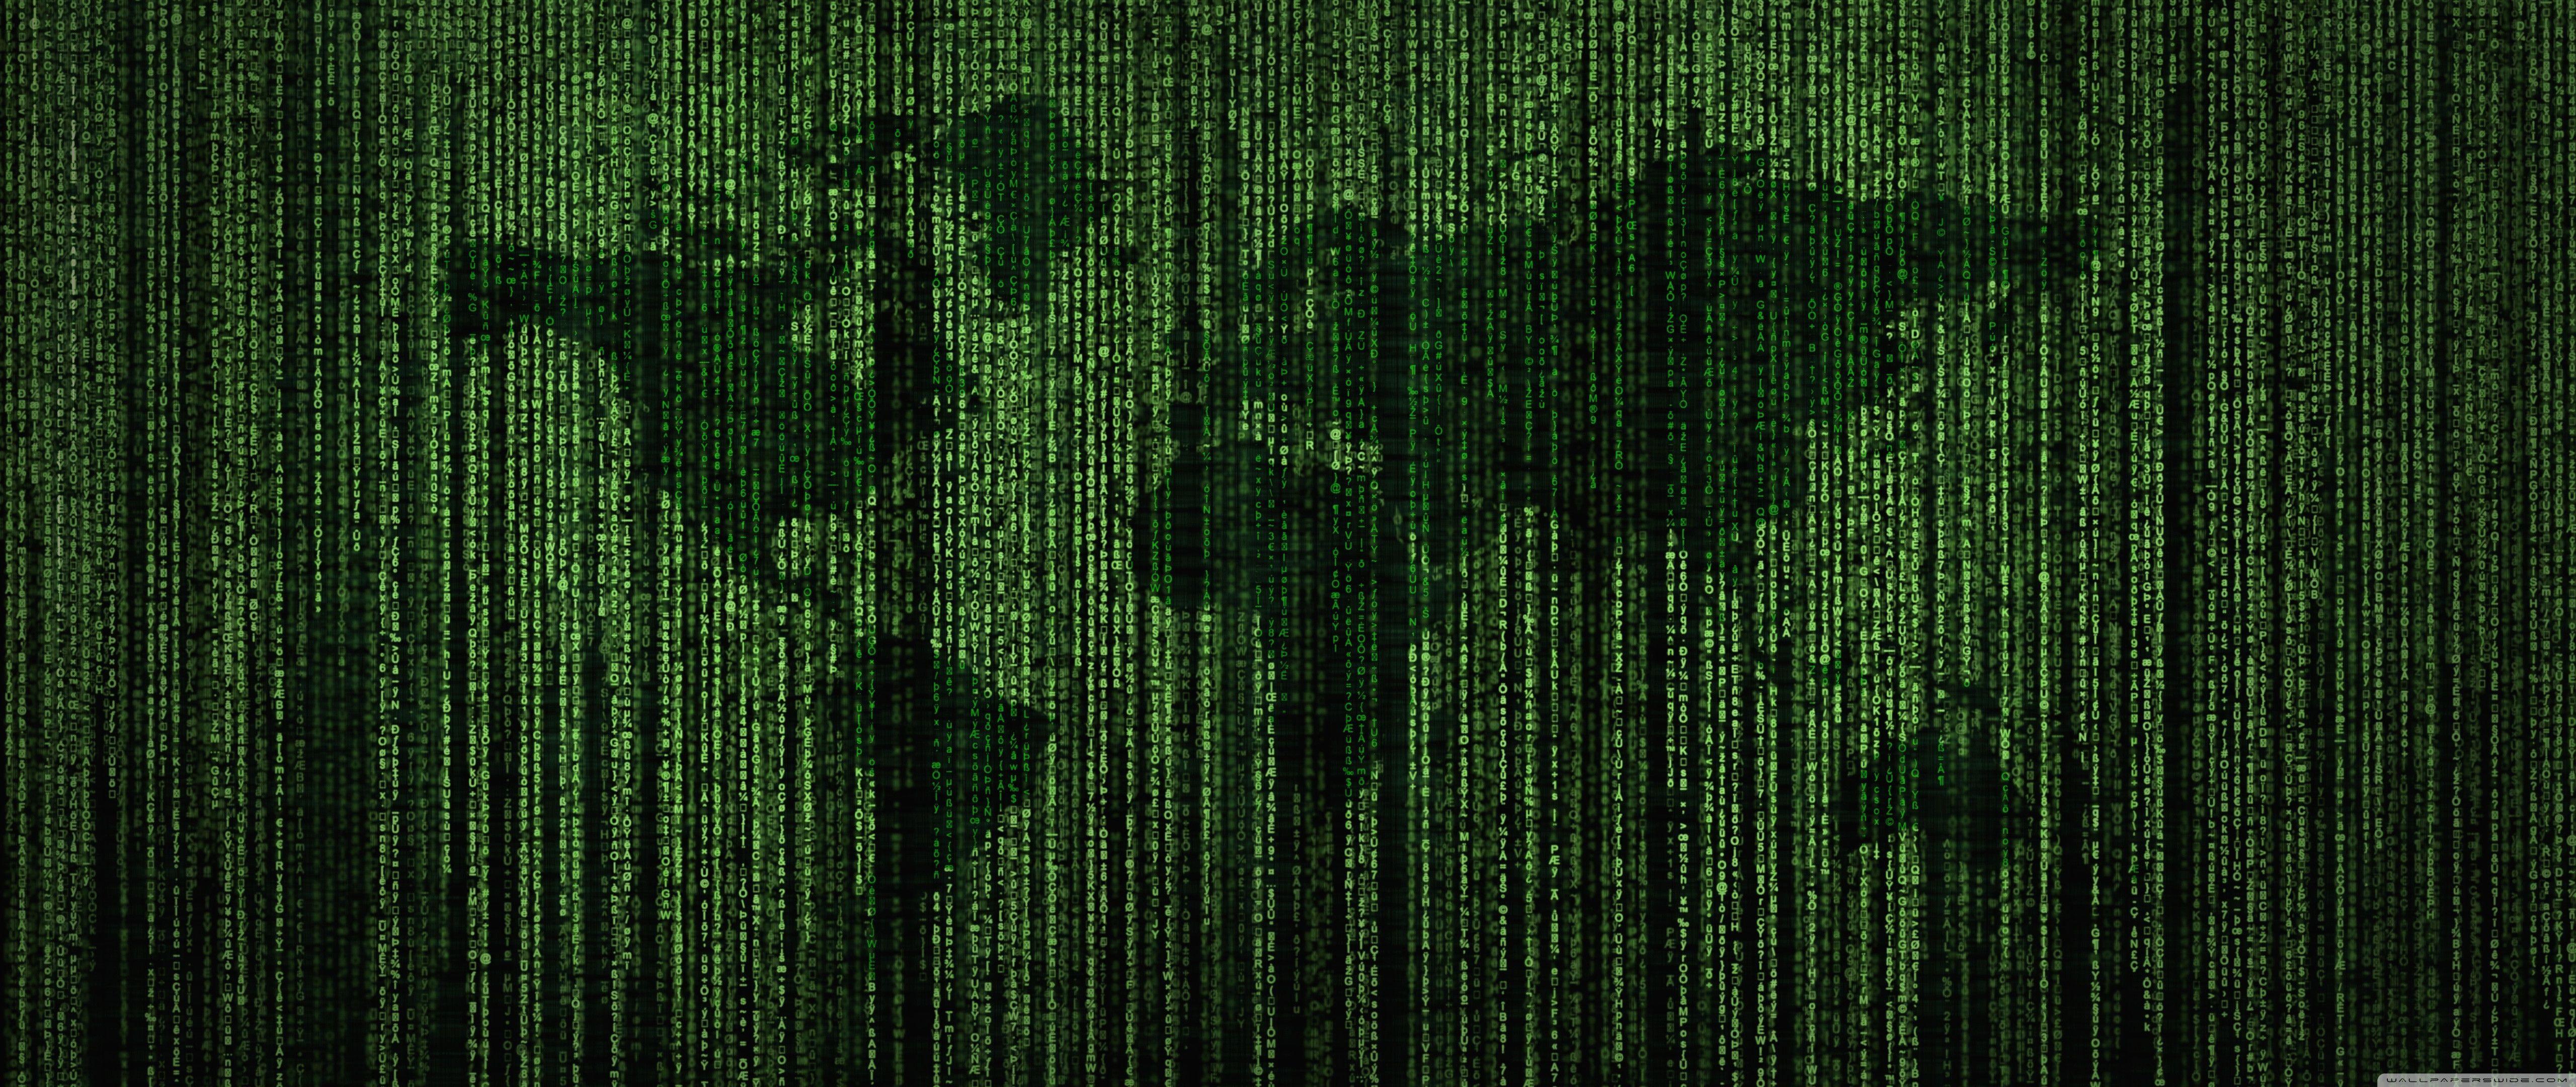 4K Matrix Wallpapers - Top Free 4K Matrix Backgrounds